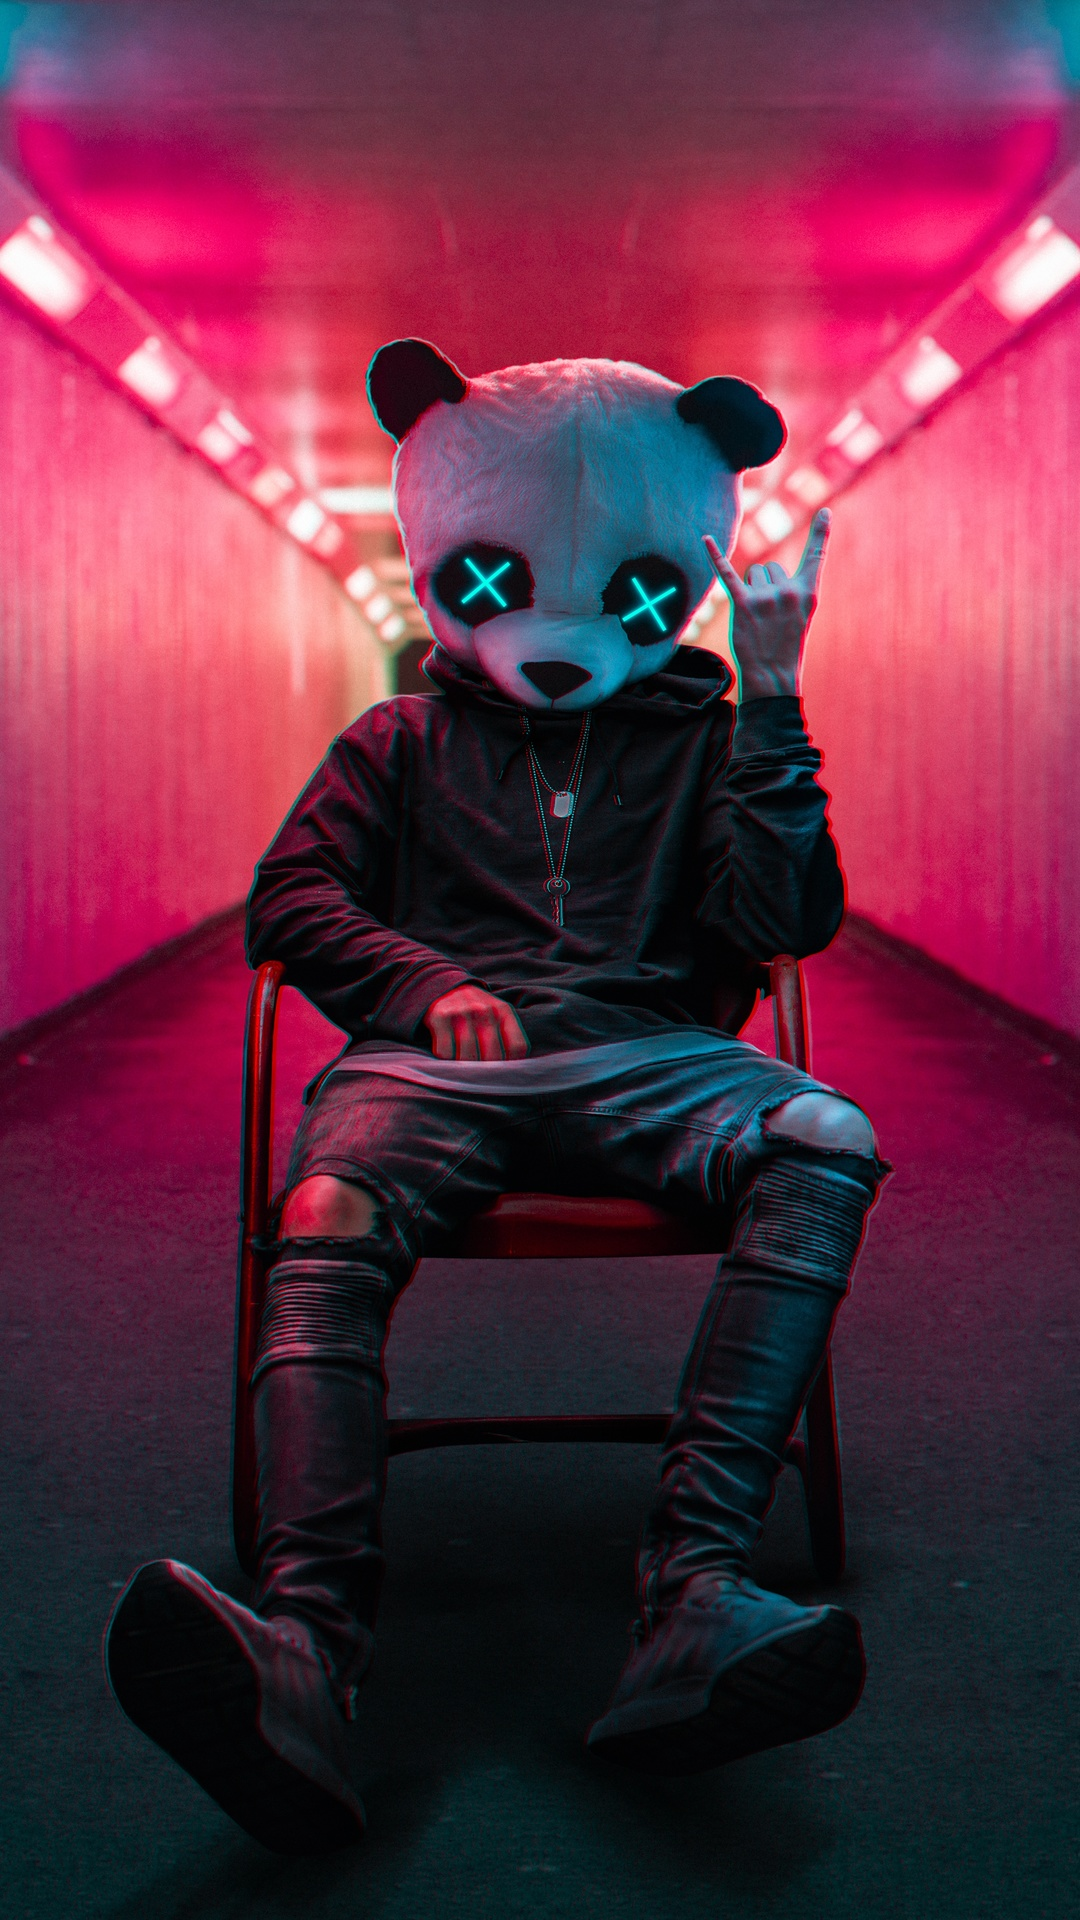 Rockstar Panda Mask